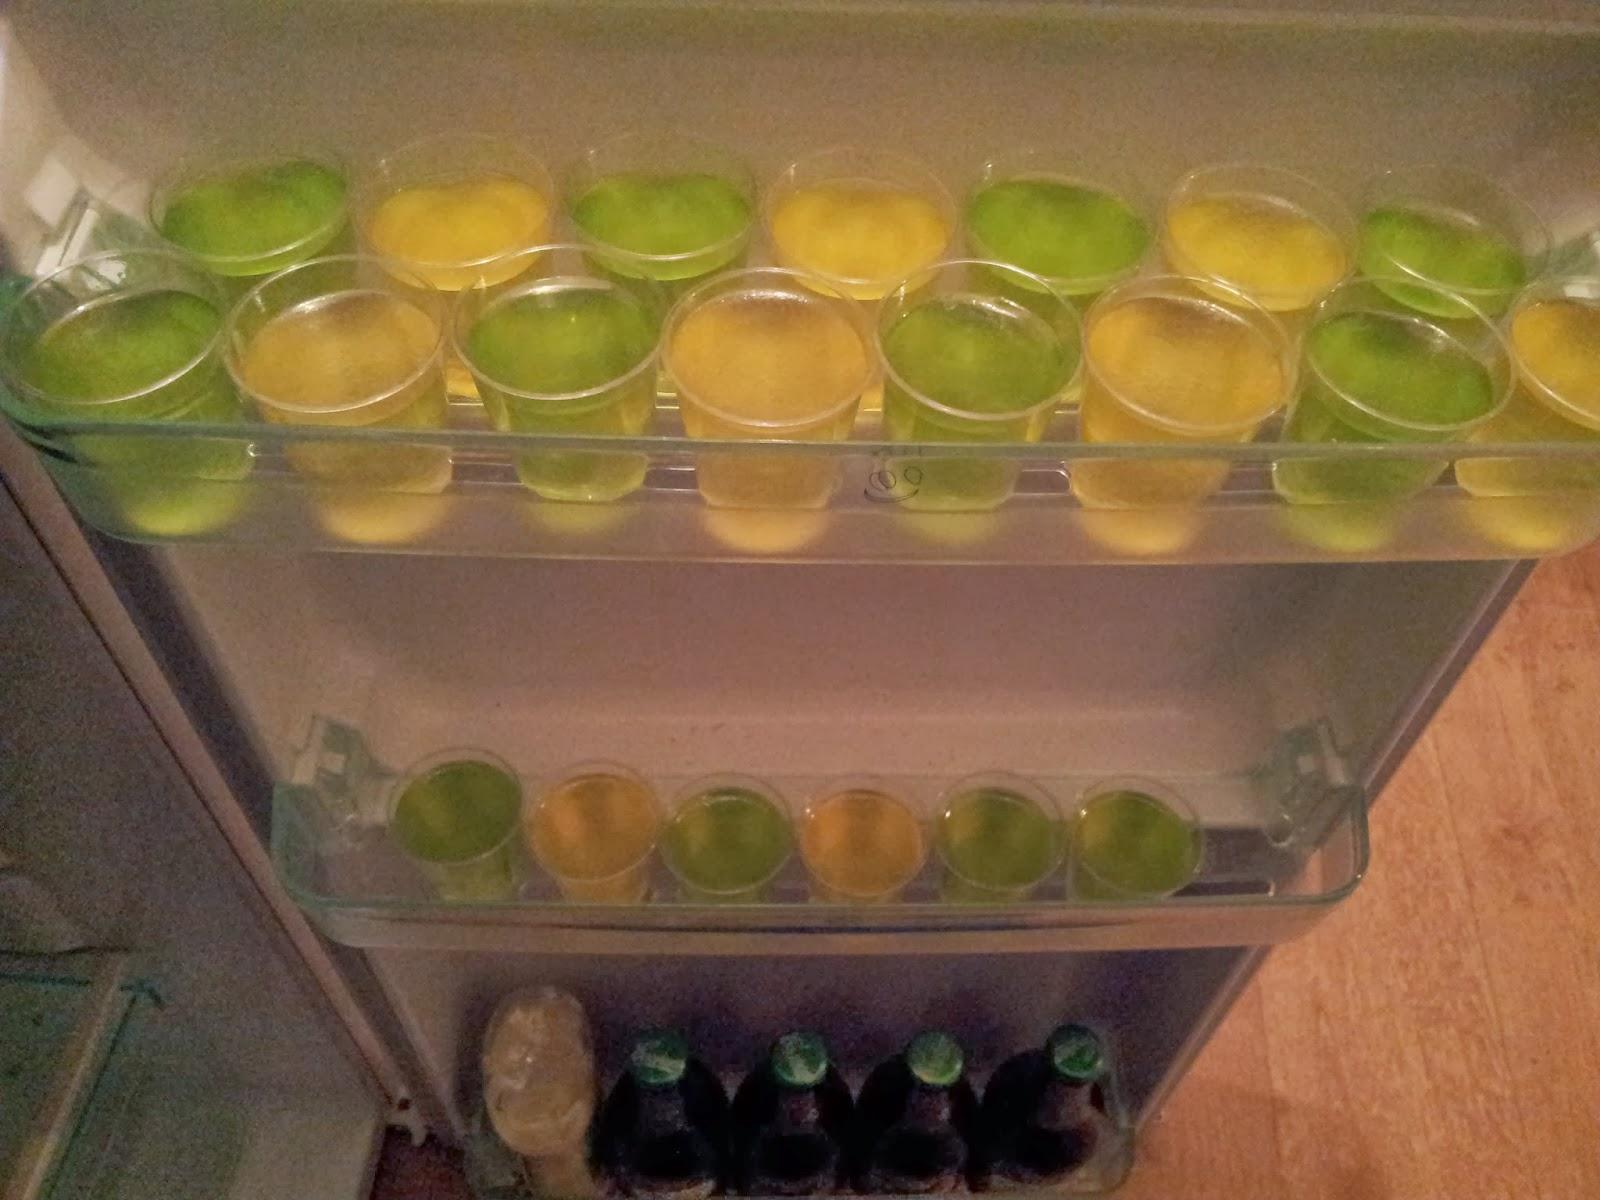 Easy vodka jelly shots recipe vinspire for Easy shot recipes with vodka